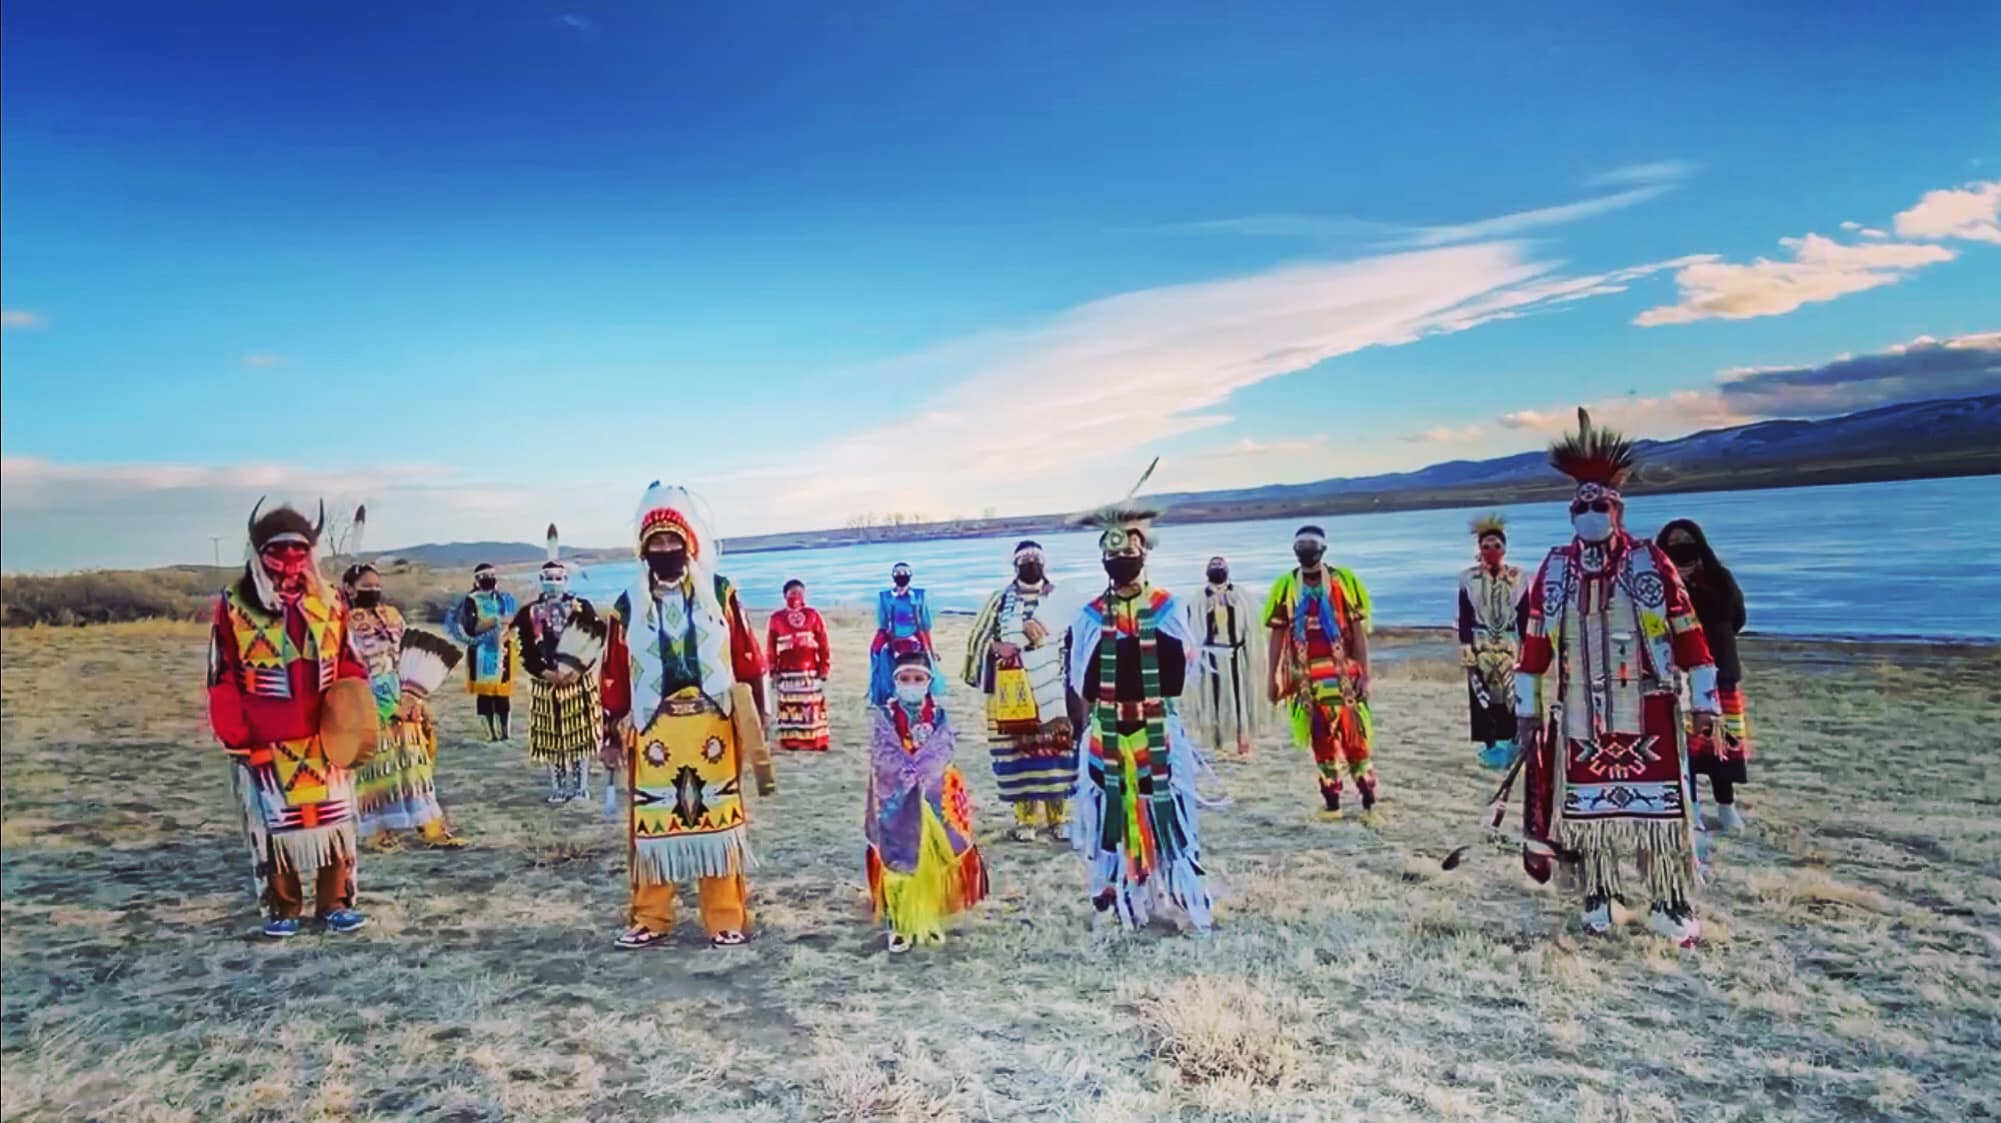 Native American Dancers of Wind River Participate in Inauguration Parade